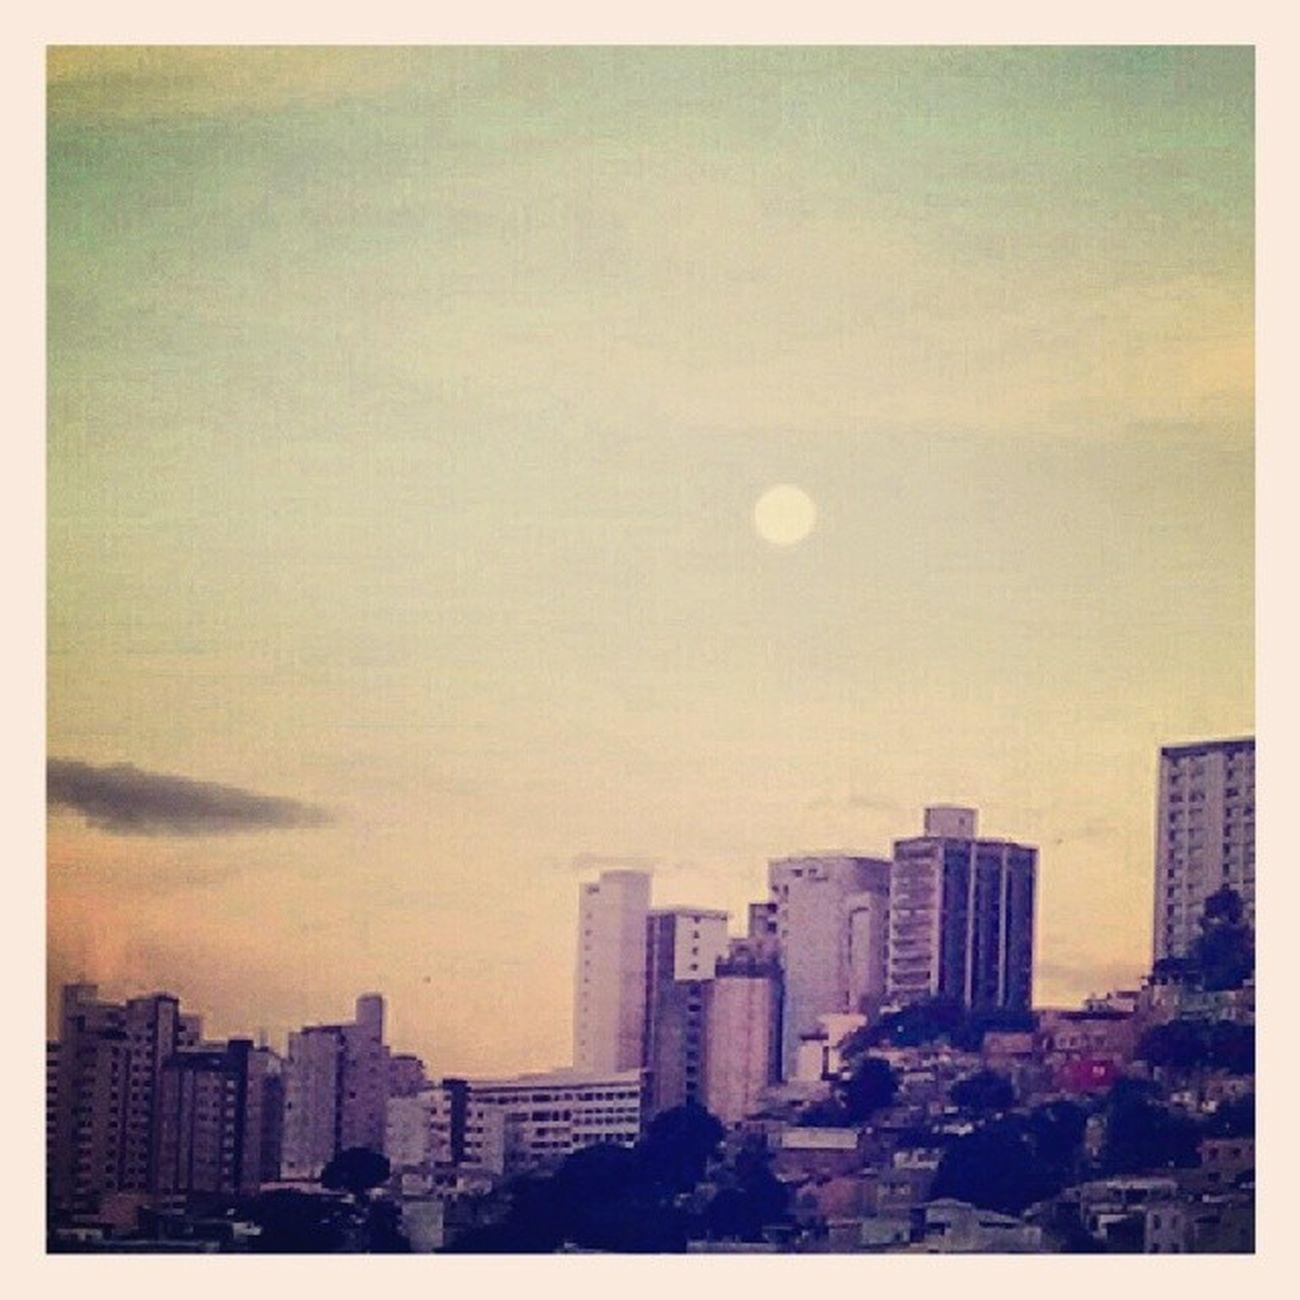 A lua hj promete! PorOndeAndei Amô FoiDeusQuemFez